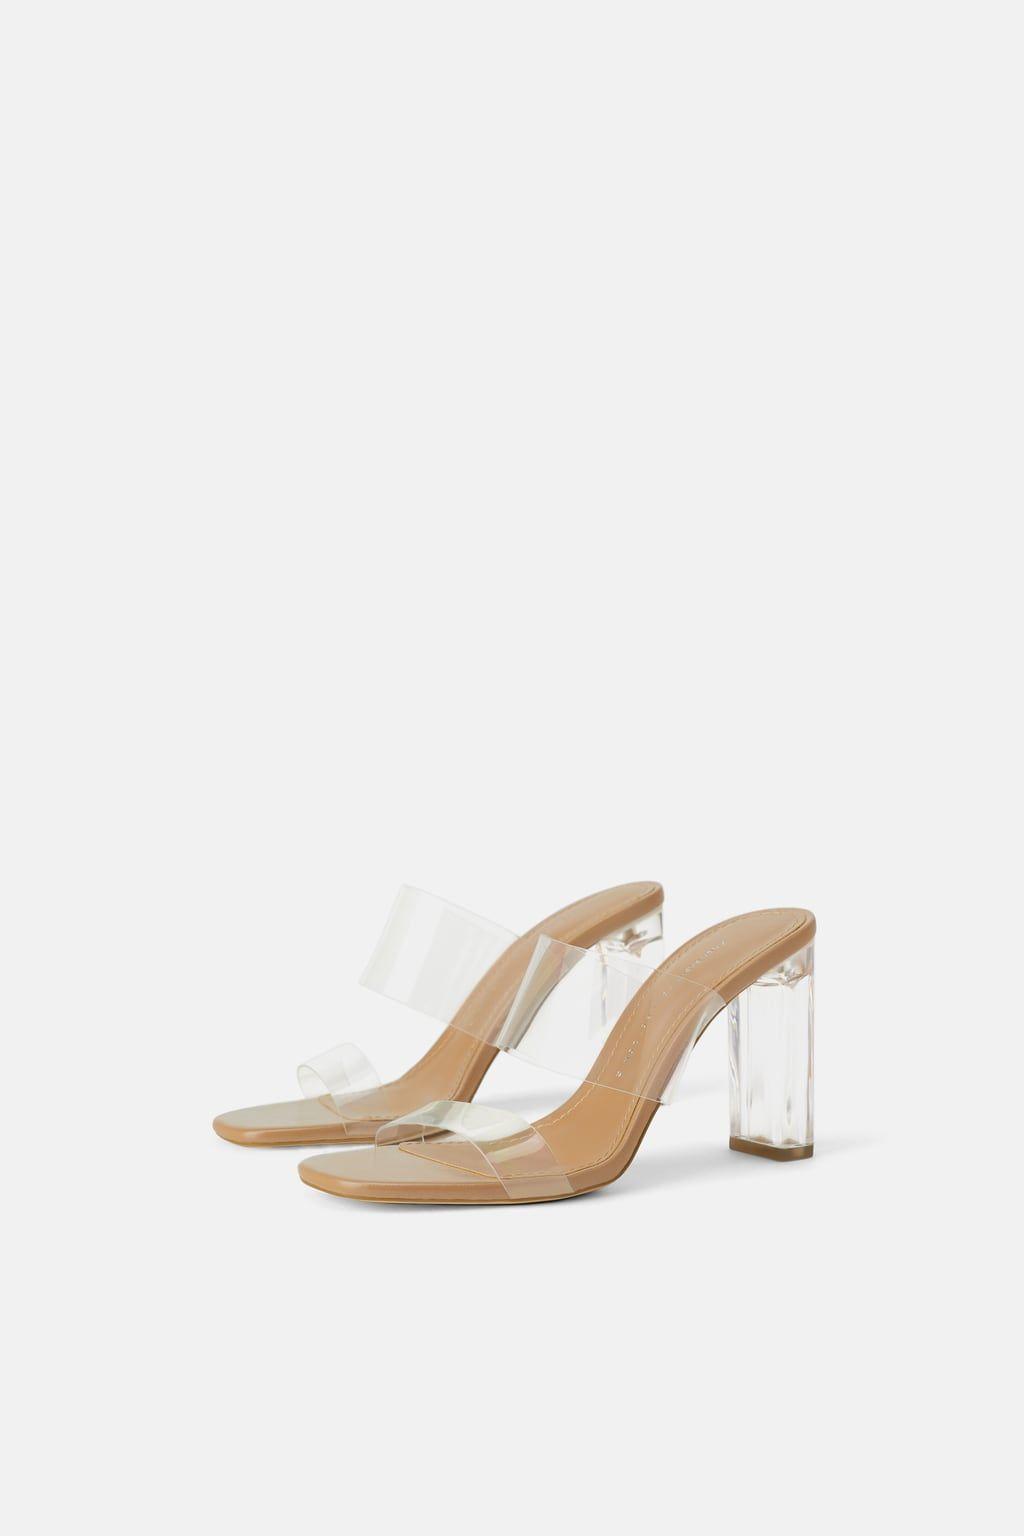 57d3b9a5f8 VINYL SANDALS WITH METHACRYLATE HEEL-DRESS TIME-WOMAN-CORNER SHOPS | ZARA  United States